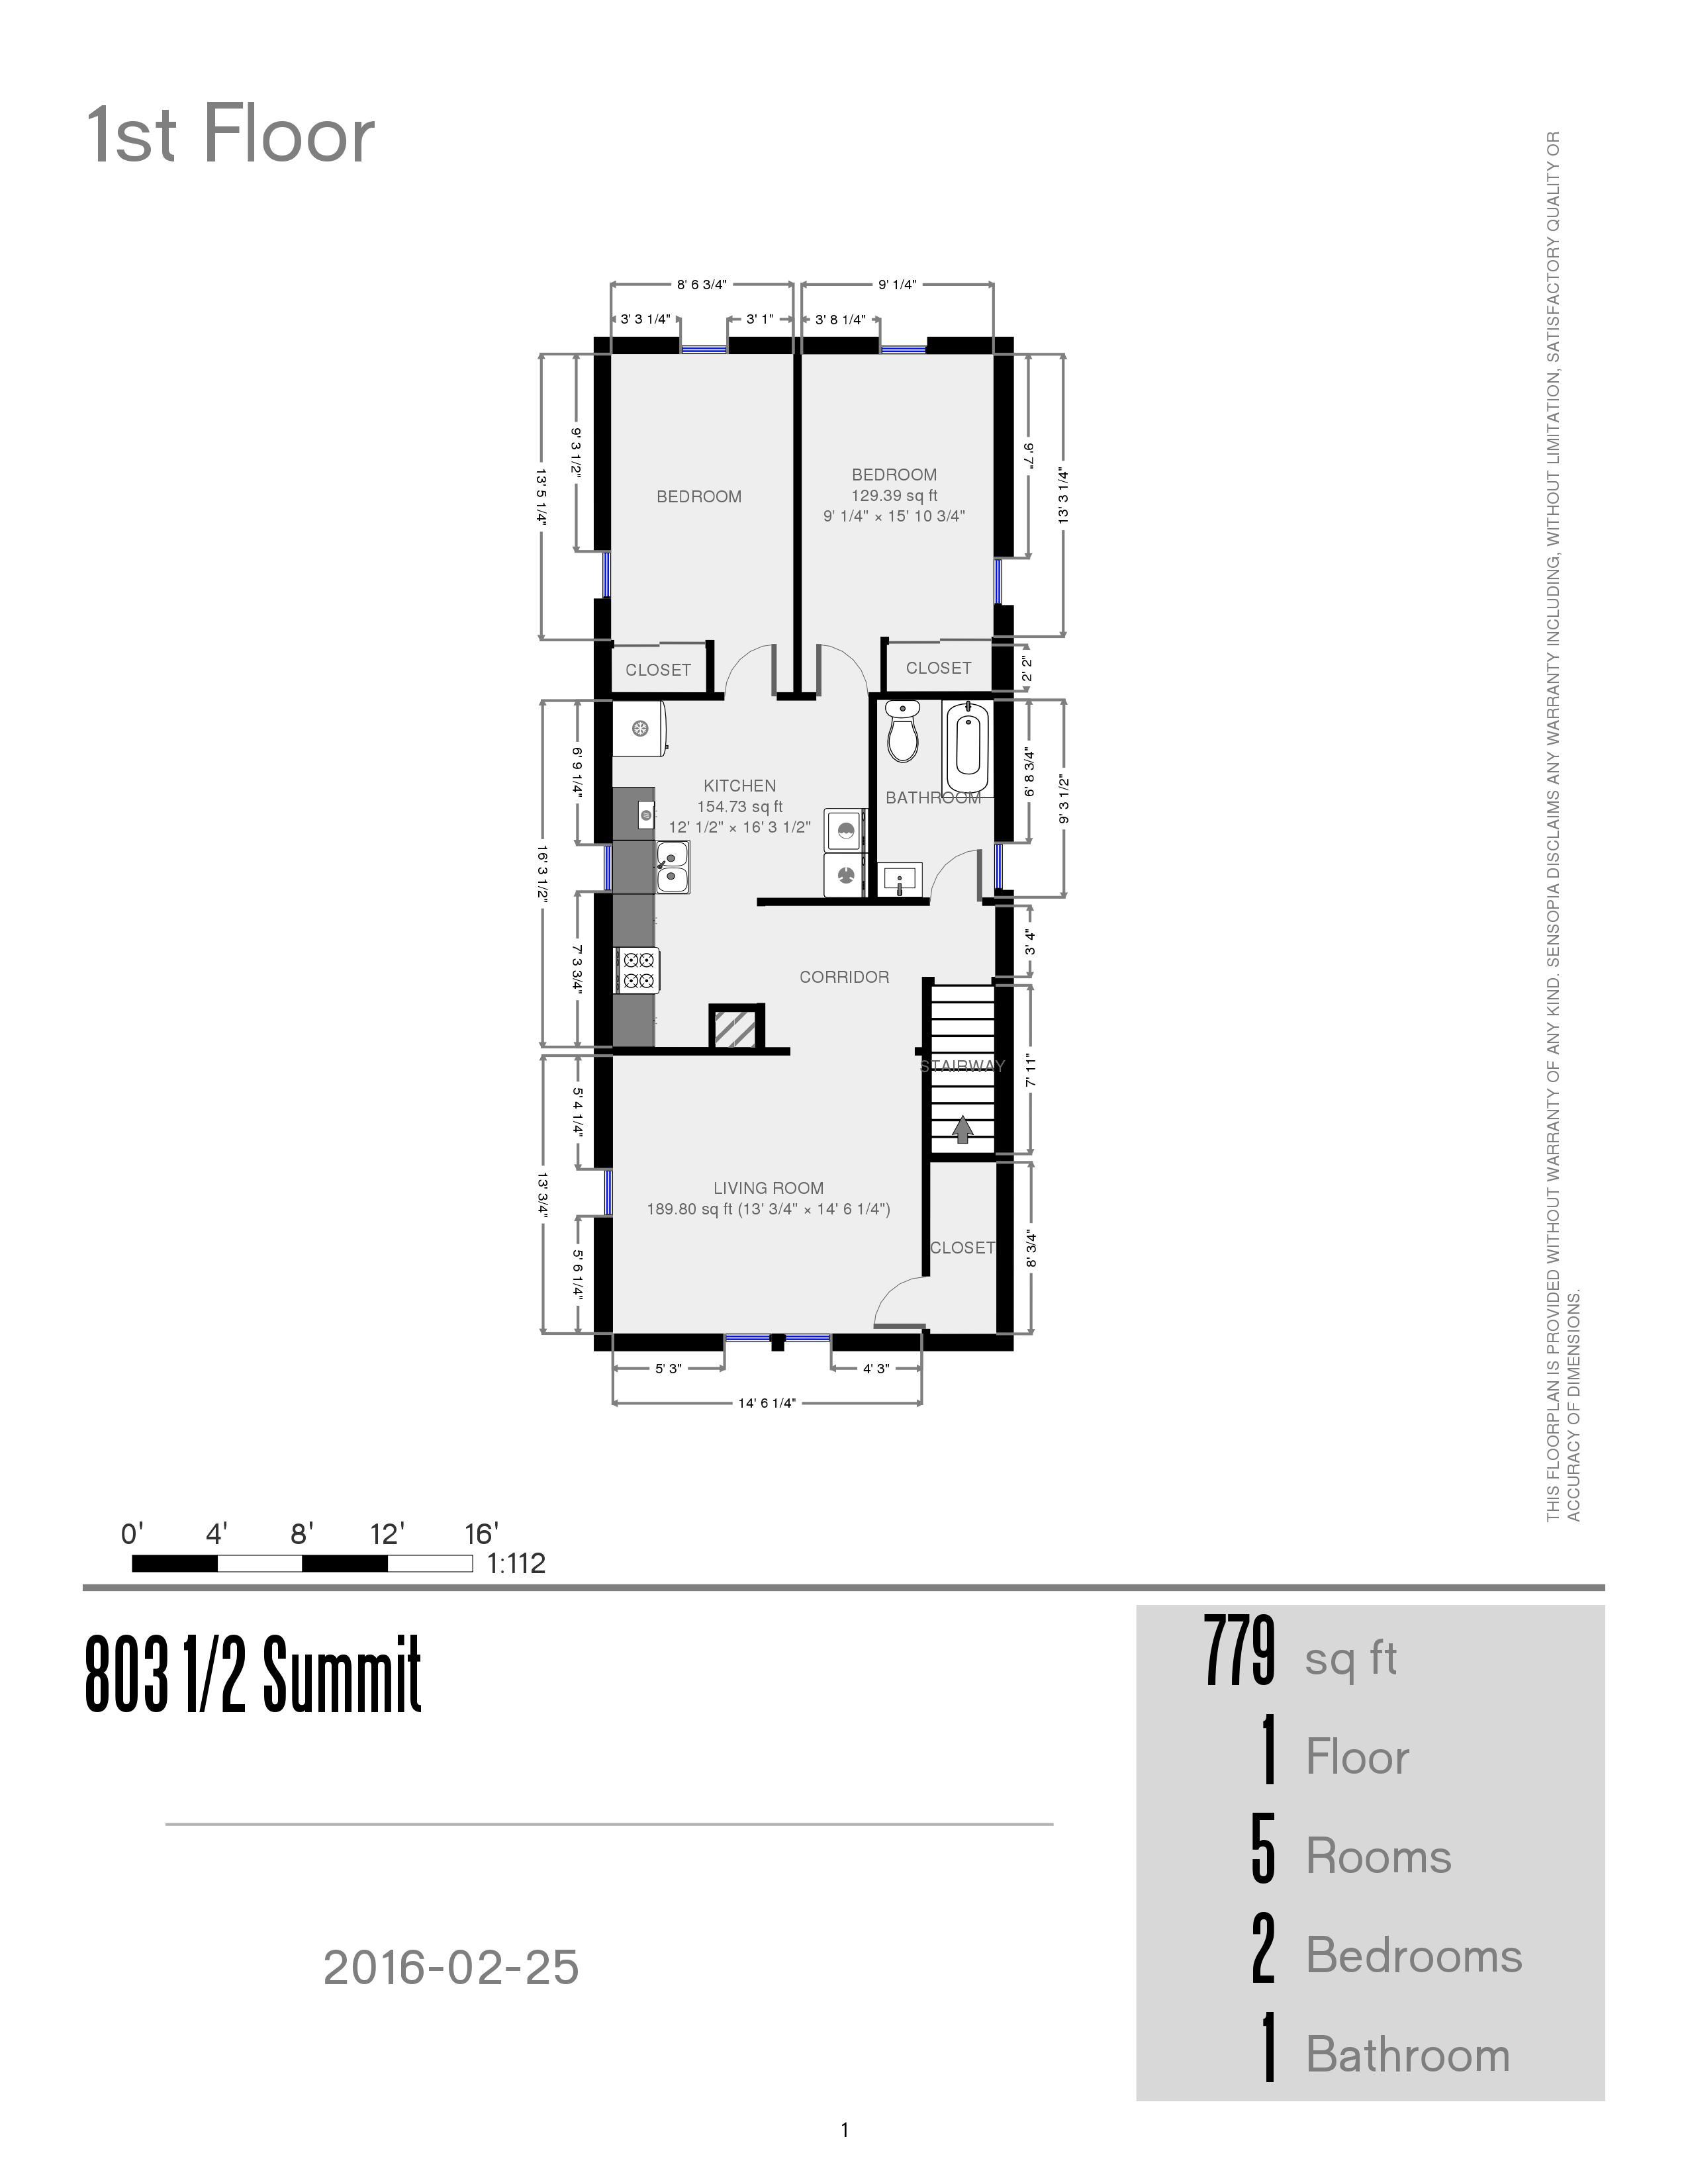 Prestige properties llc summit street for Main street homes floor plans